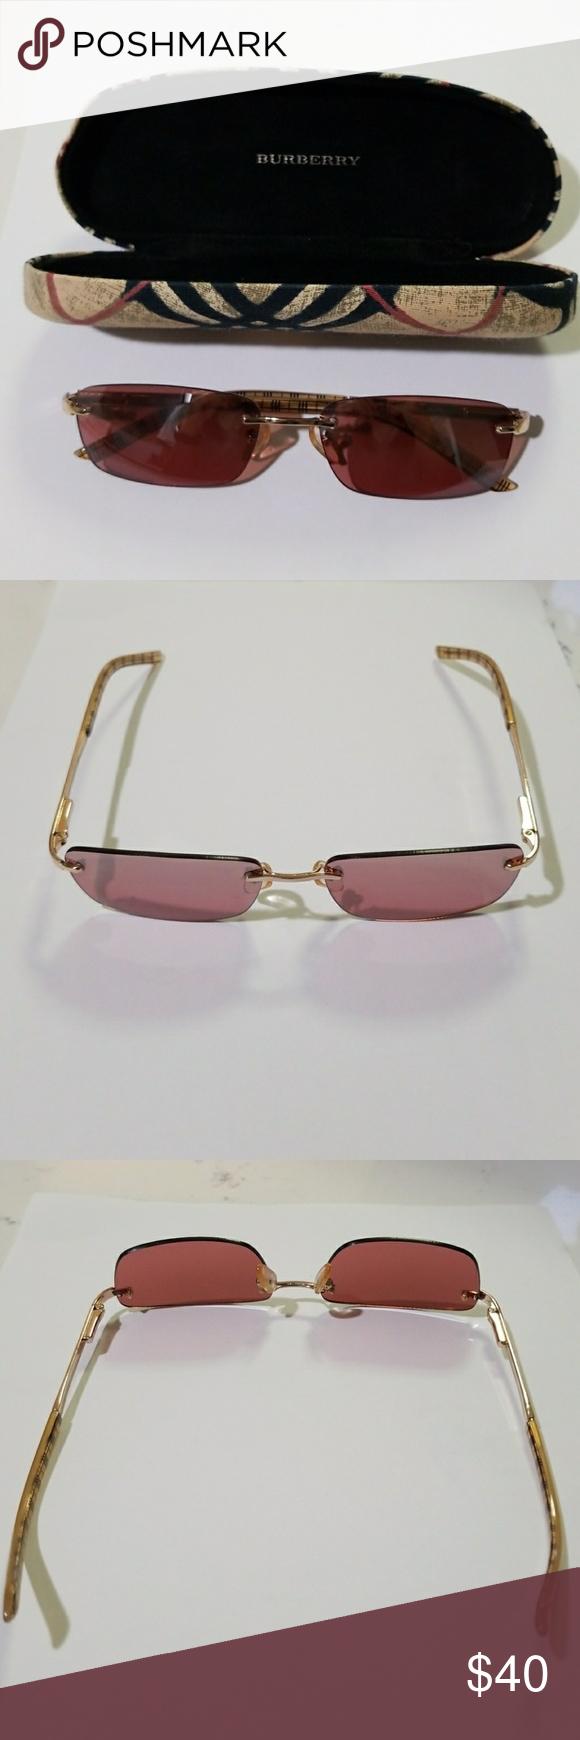 a913269014ef Burberry Sunglass Authentic Burberry Safilo B8918 Sunglasses. Rimless, Gold  Frames, Brown Lens Burberry Accessories Glasses